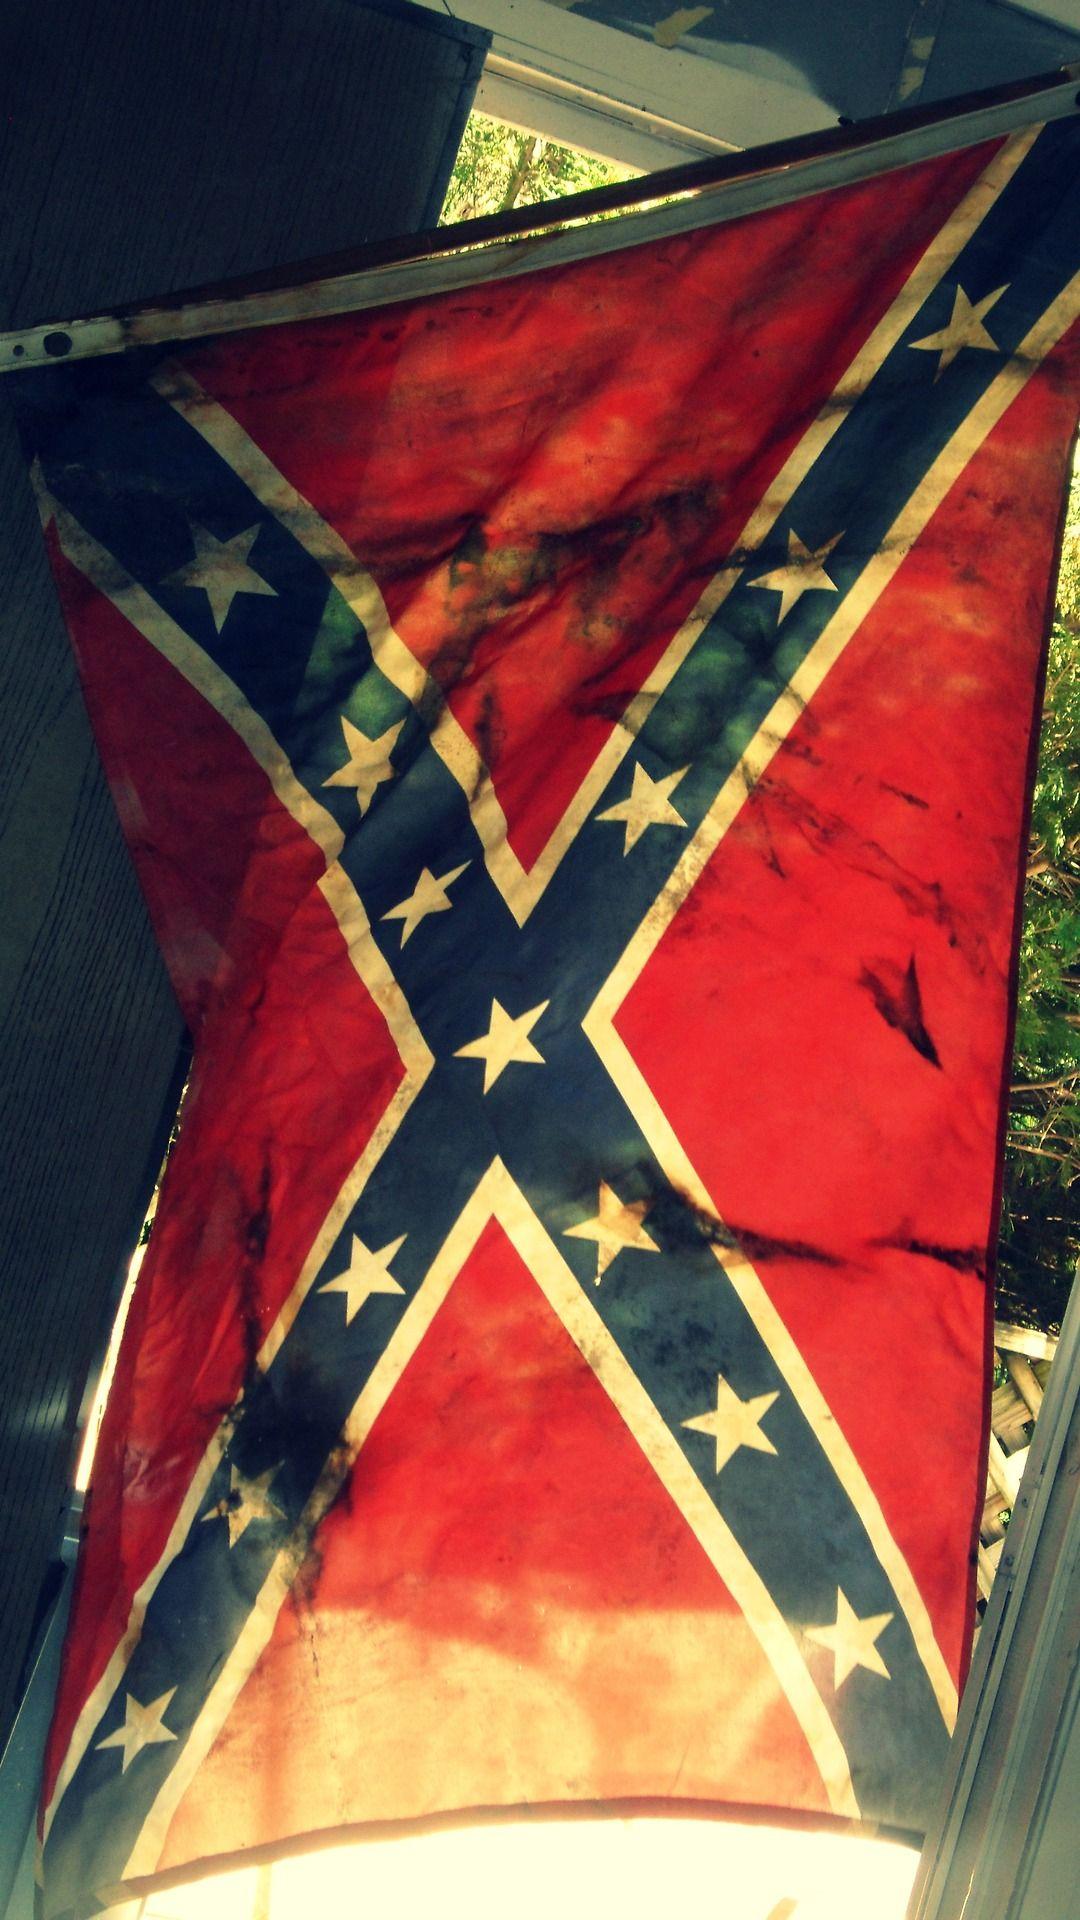 Free Rebel Flag Wallpaper Hd 1920x1080 6375 Free Rebel Flag